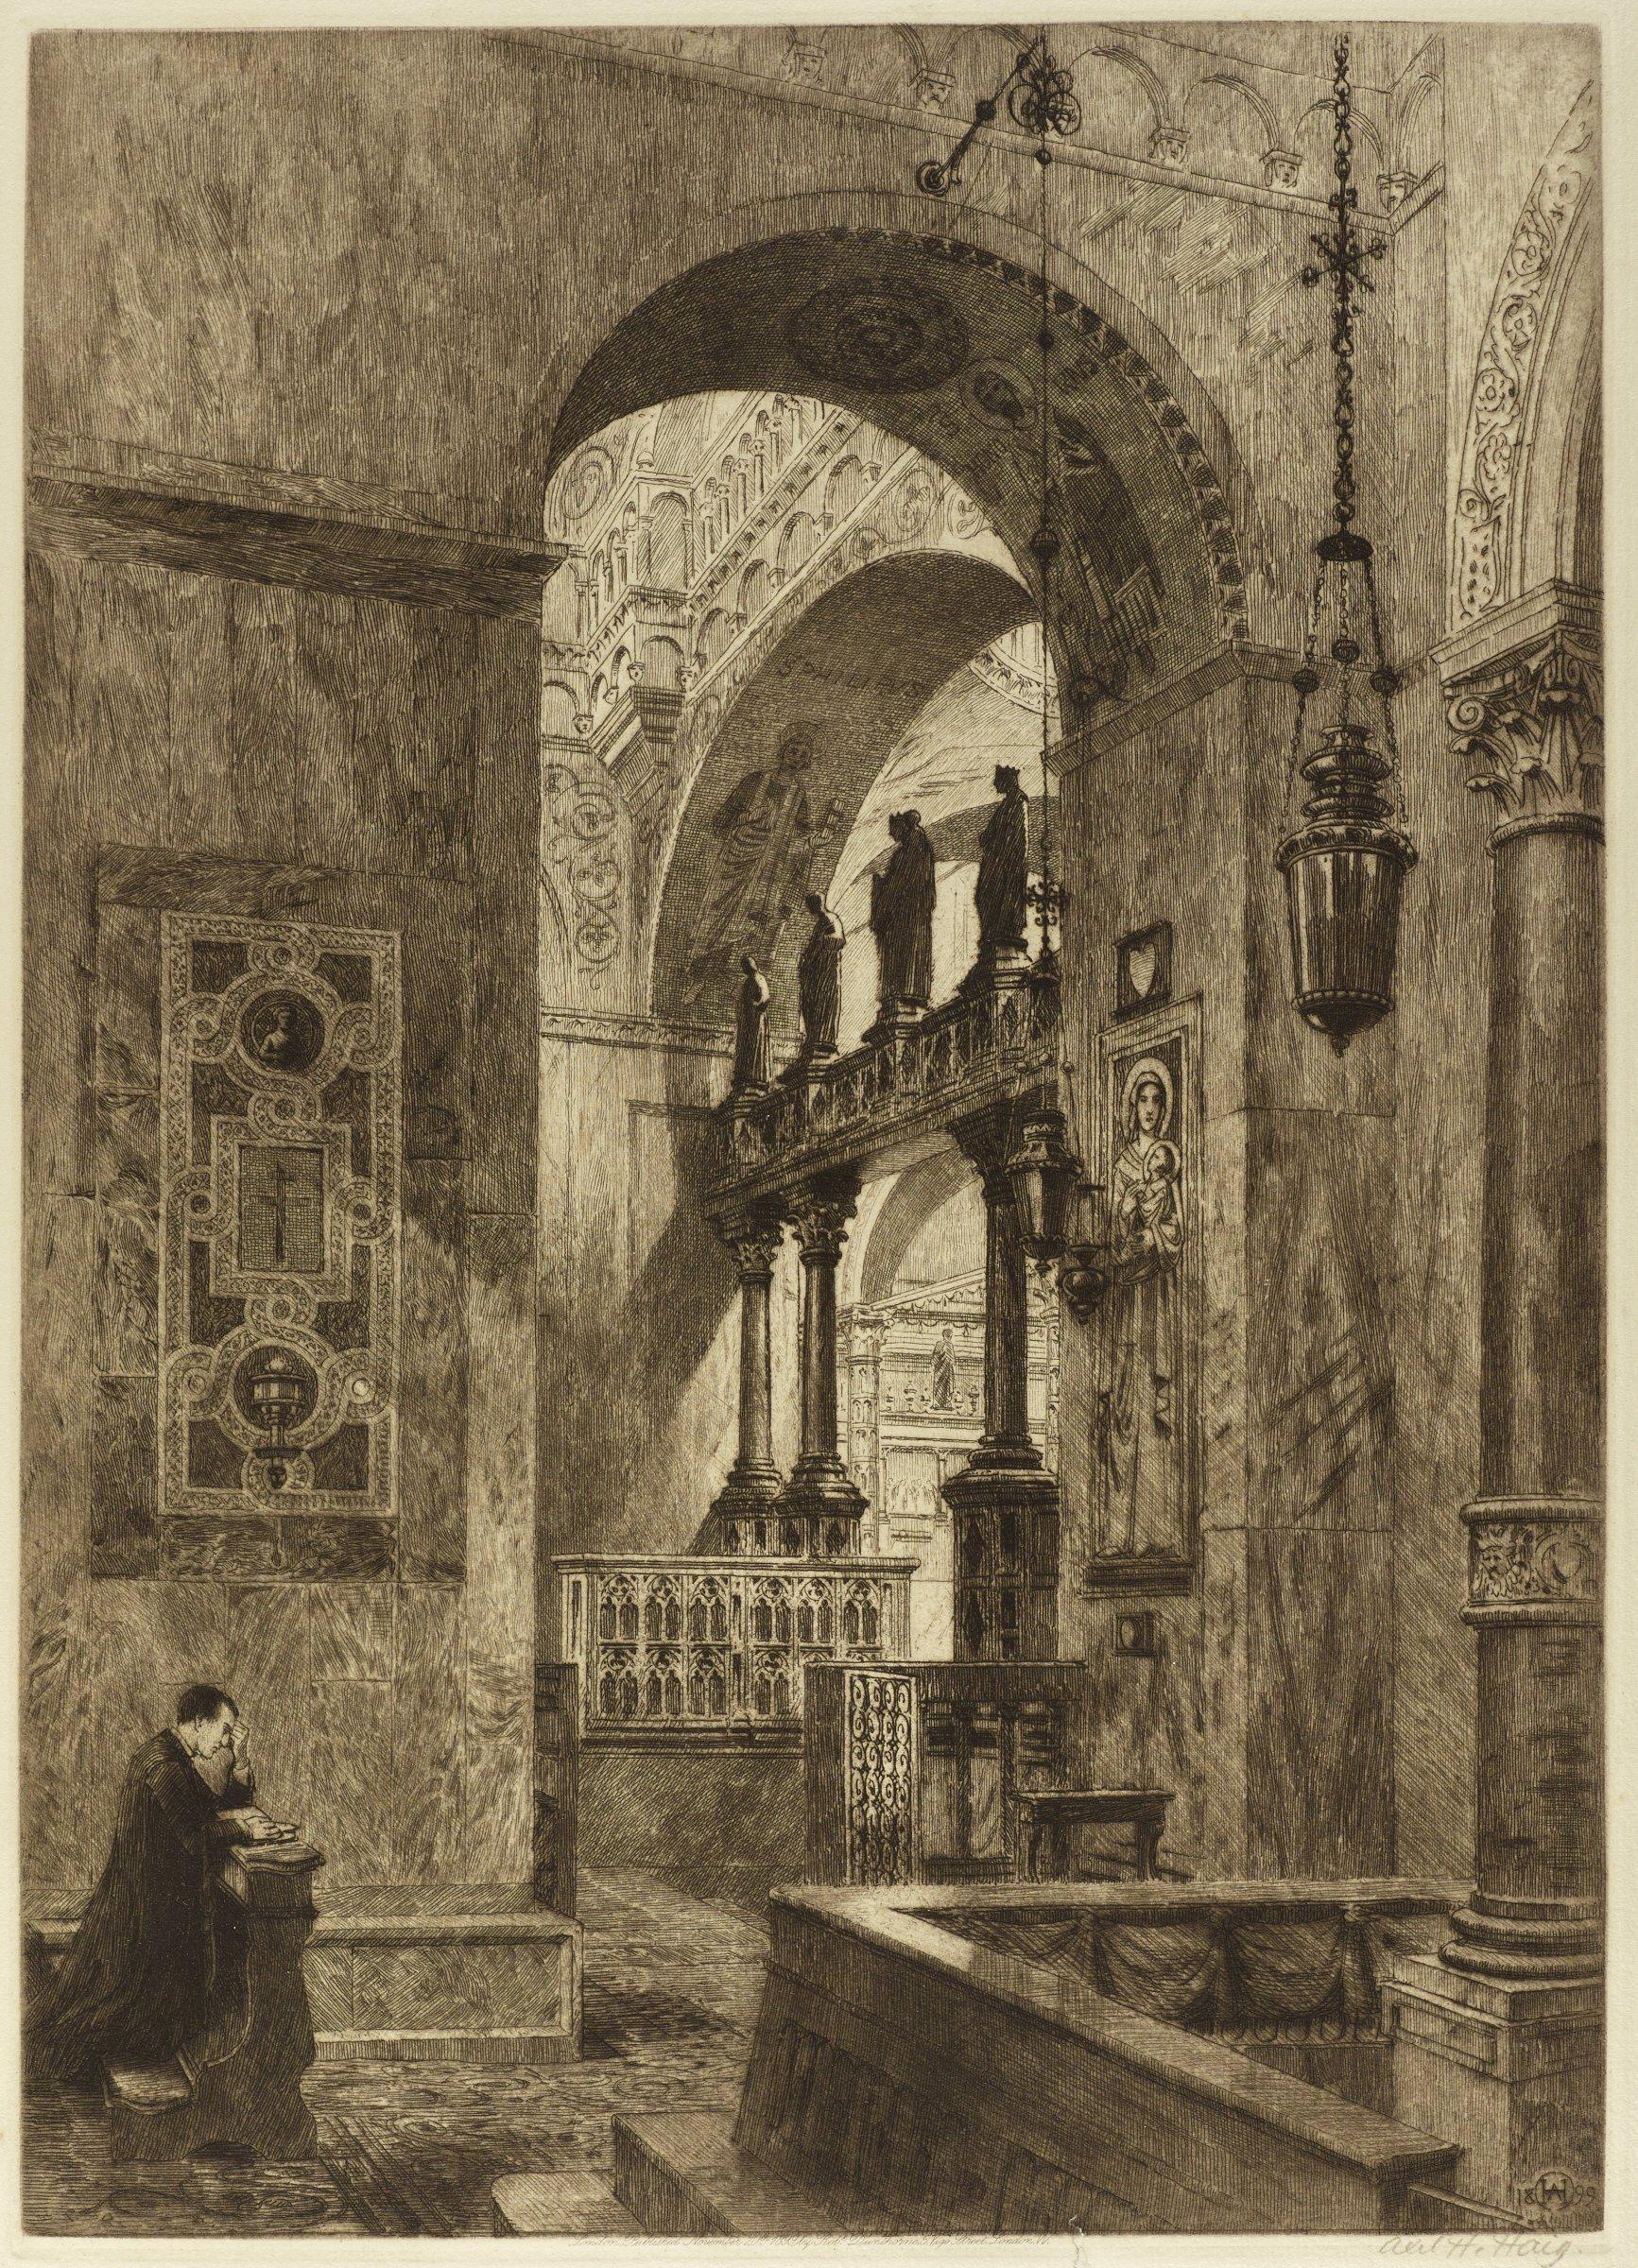 In a church interior, a man kneels in prayer near an archway.